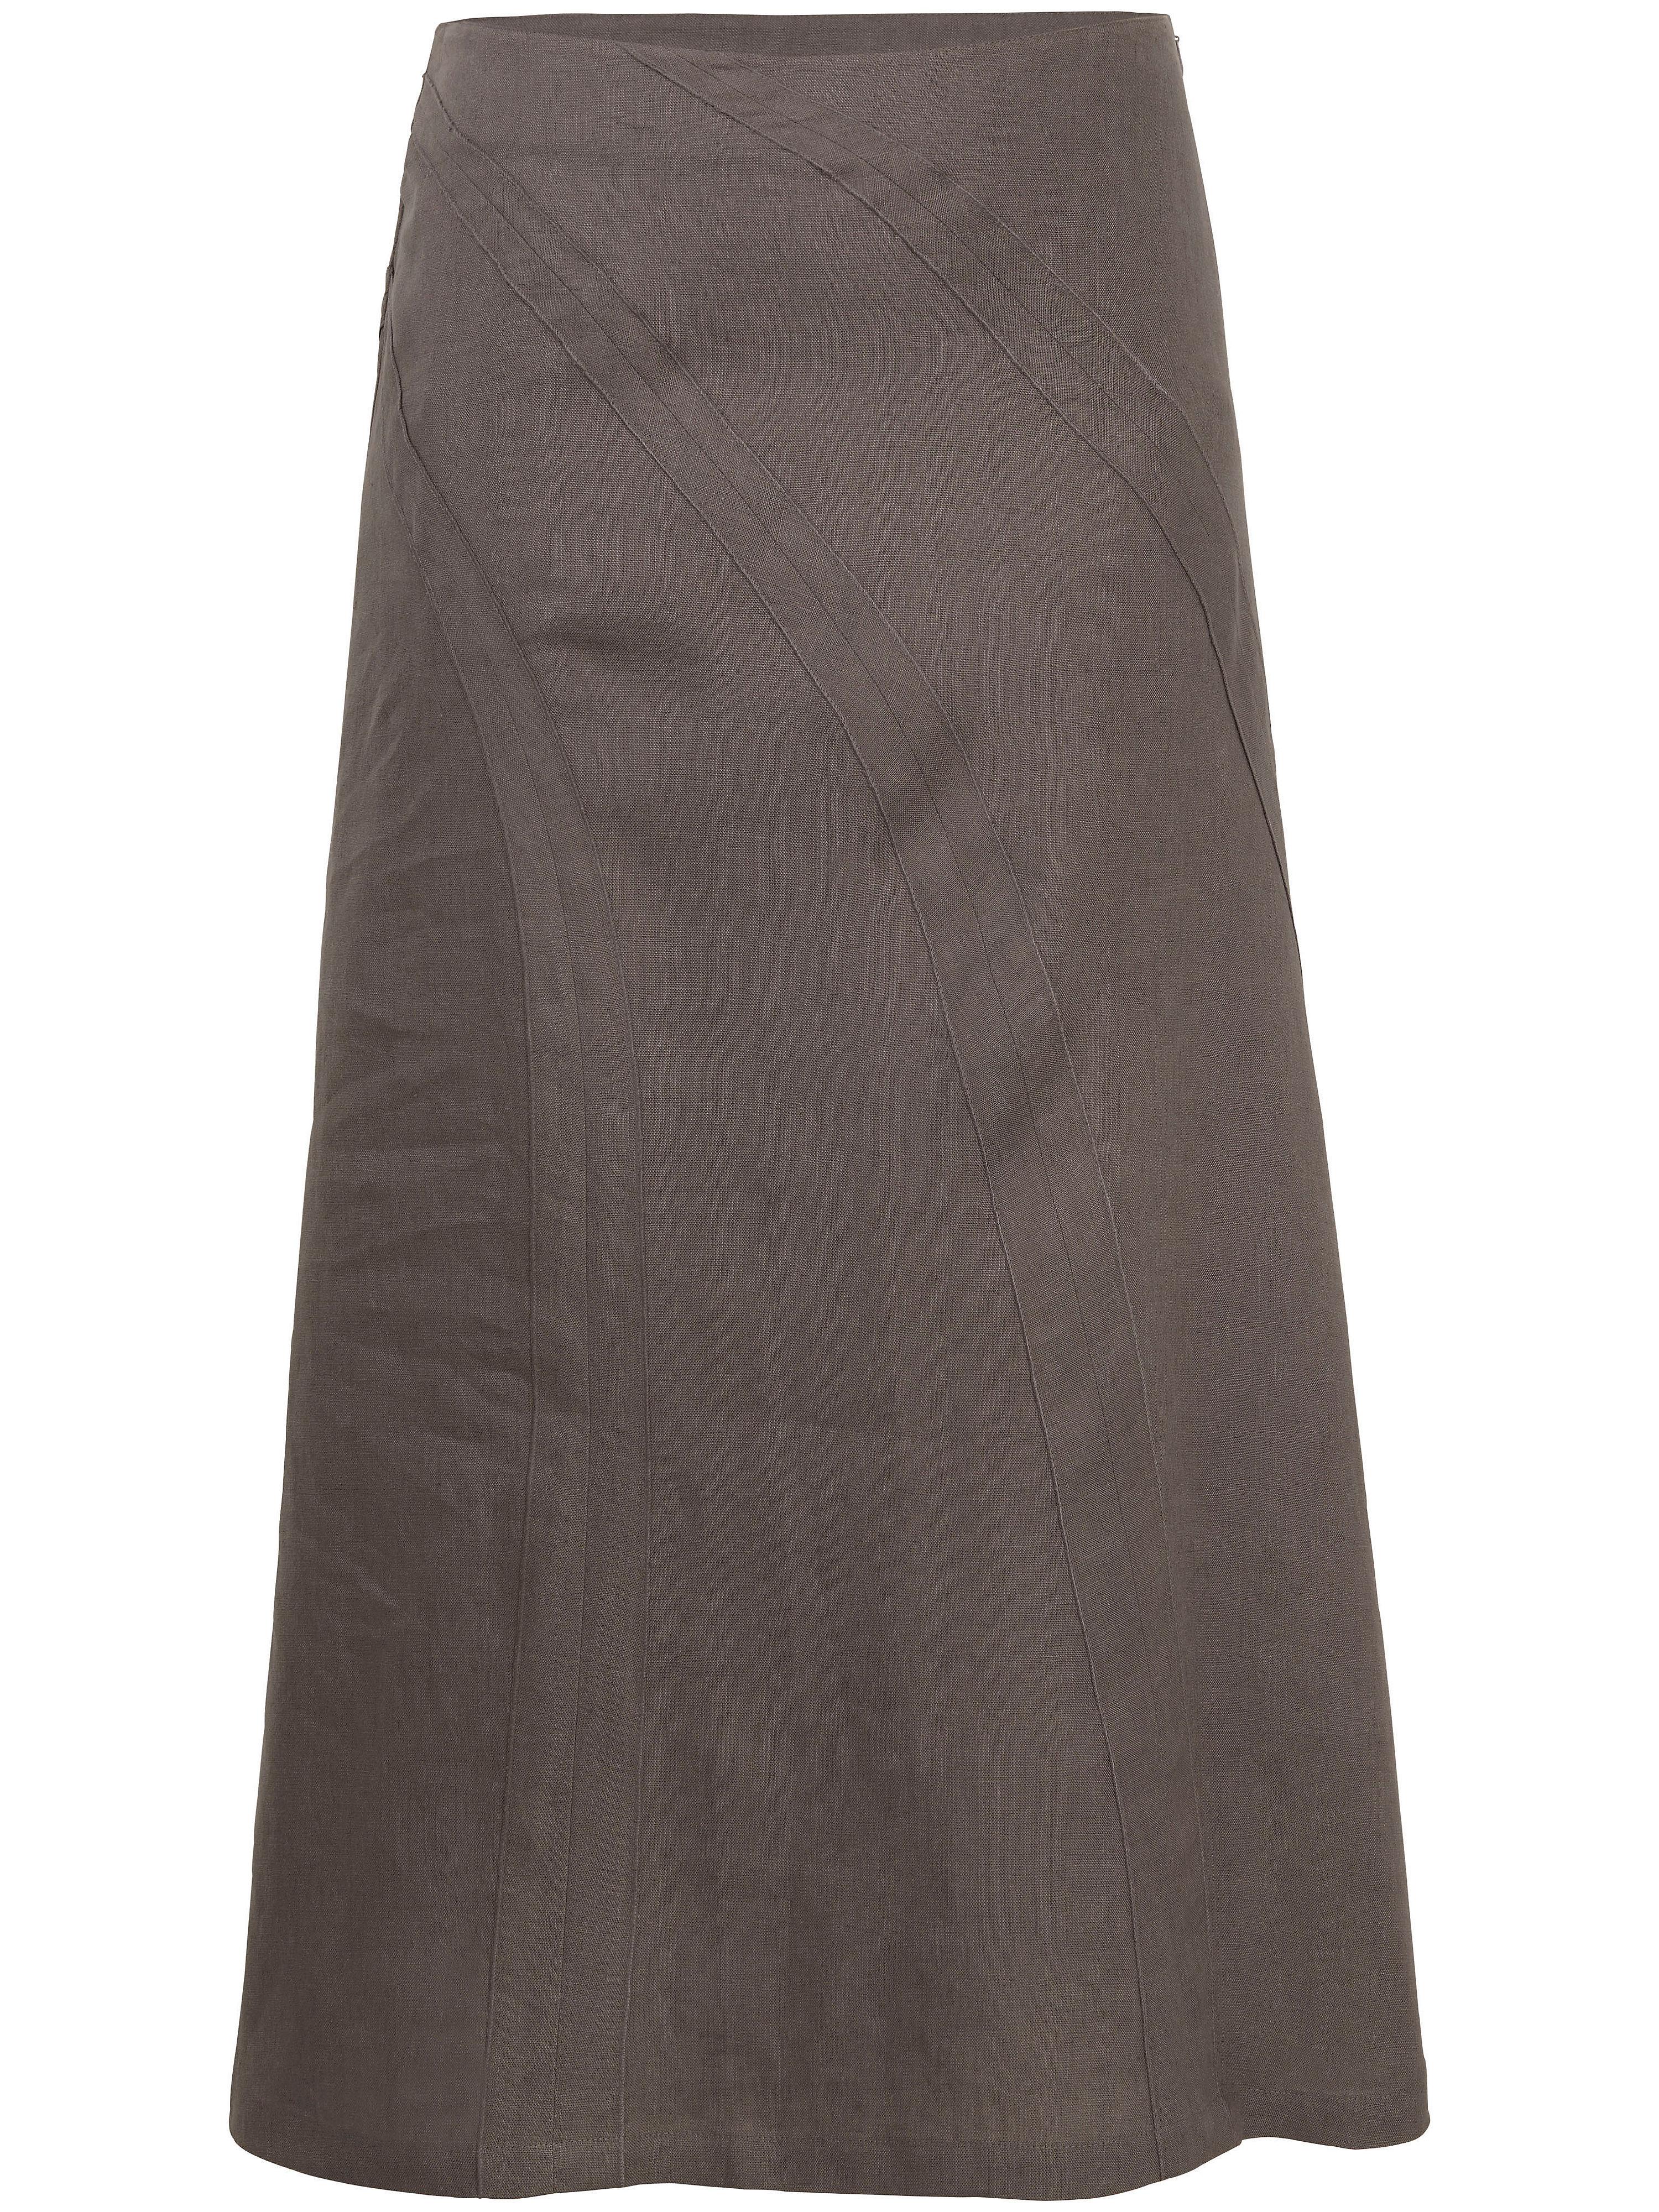 Image of   Nederdel Fra Anna Aura brun